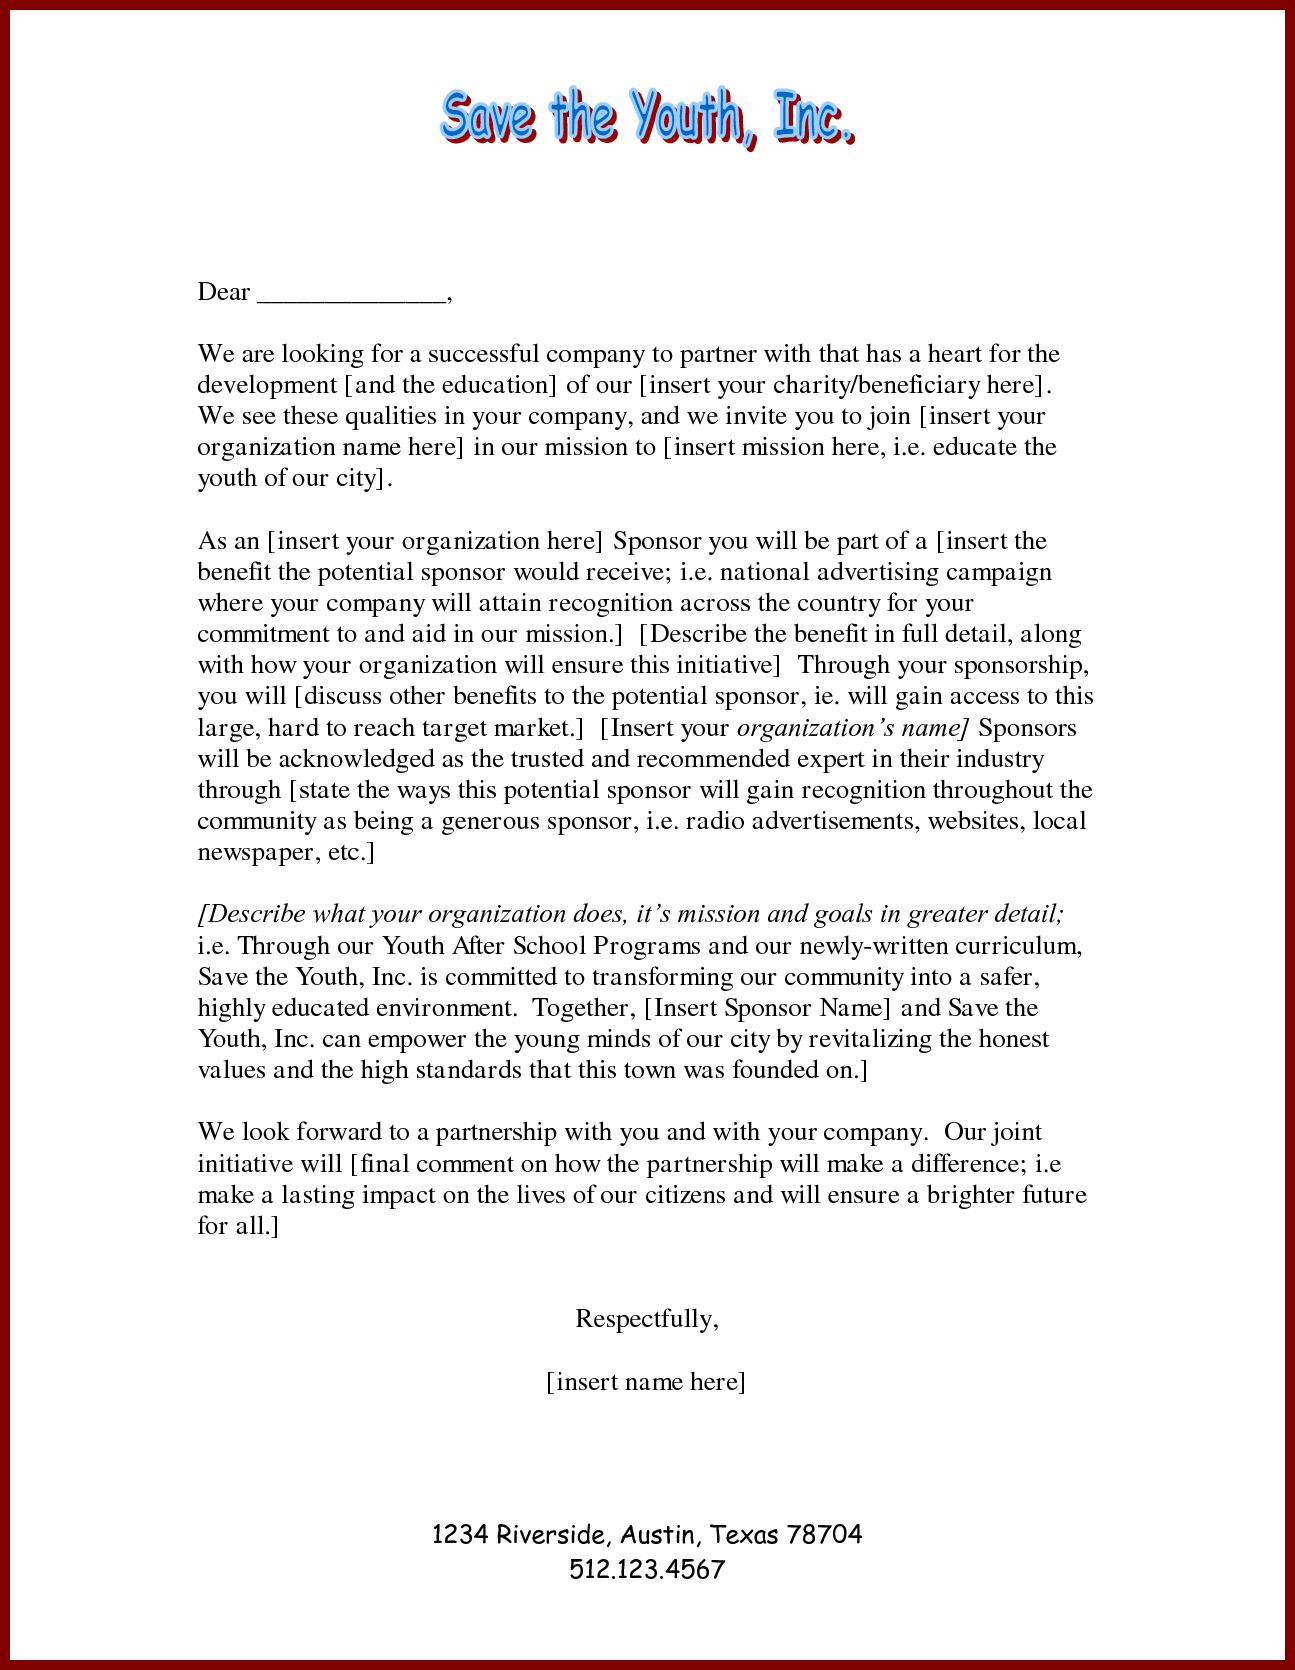 School Sponsorship Letter Template - How to Write Sponsorship Letter Gallery Letter format formal Sample